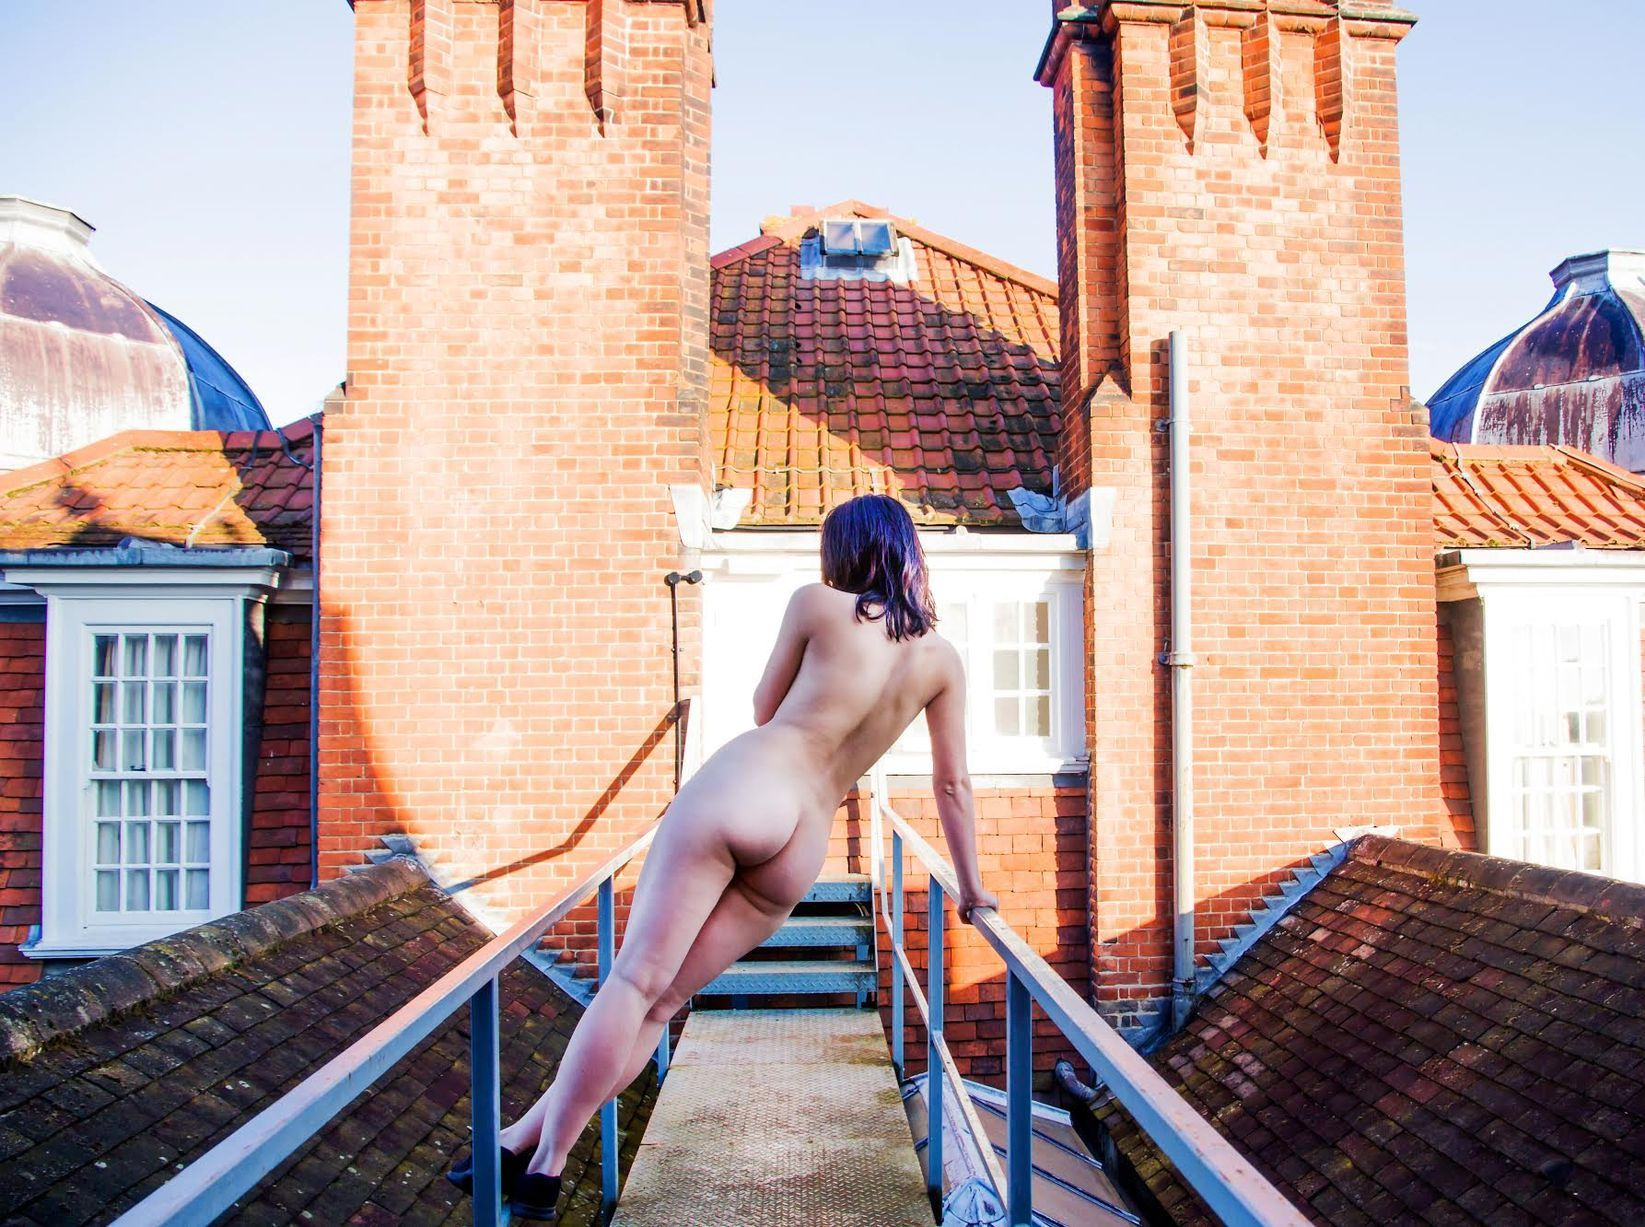 Image may contain: Swimwear, Maillot, Bikini, Brick, Human, Person, People